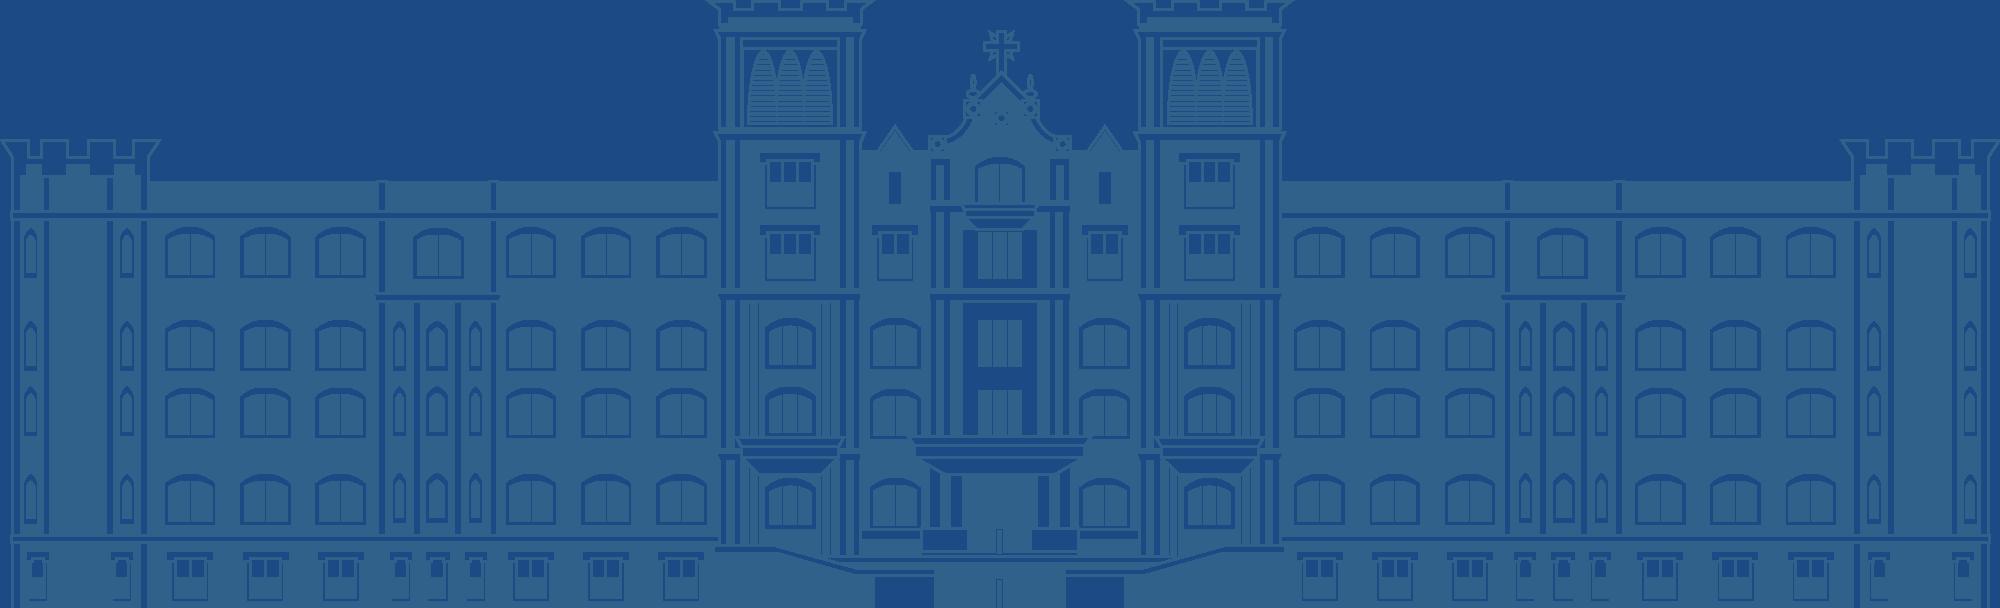 Illustration of Tower Hall